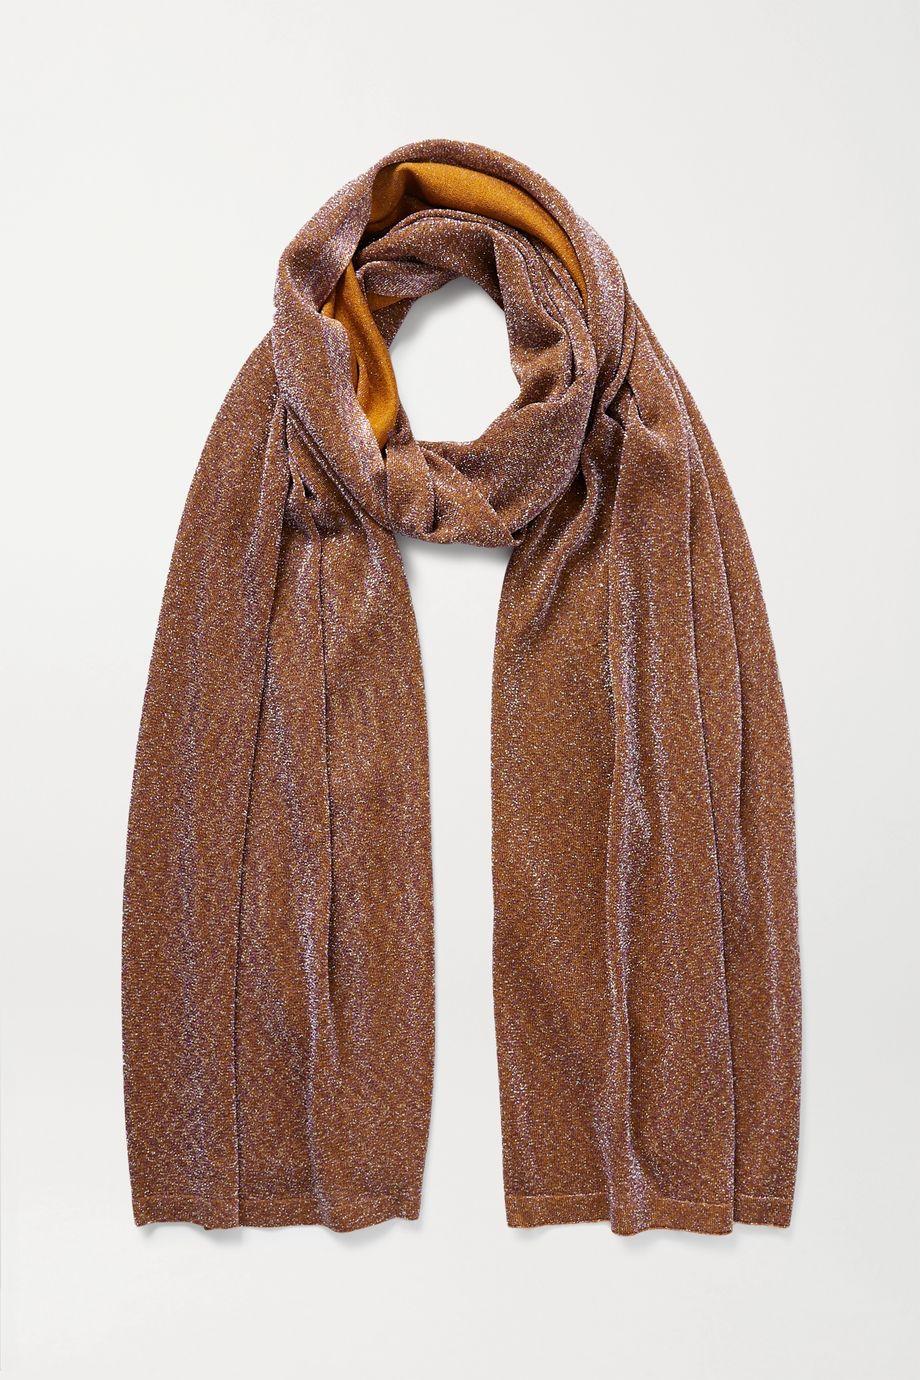 Missoni Lurex scarf